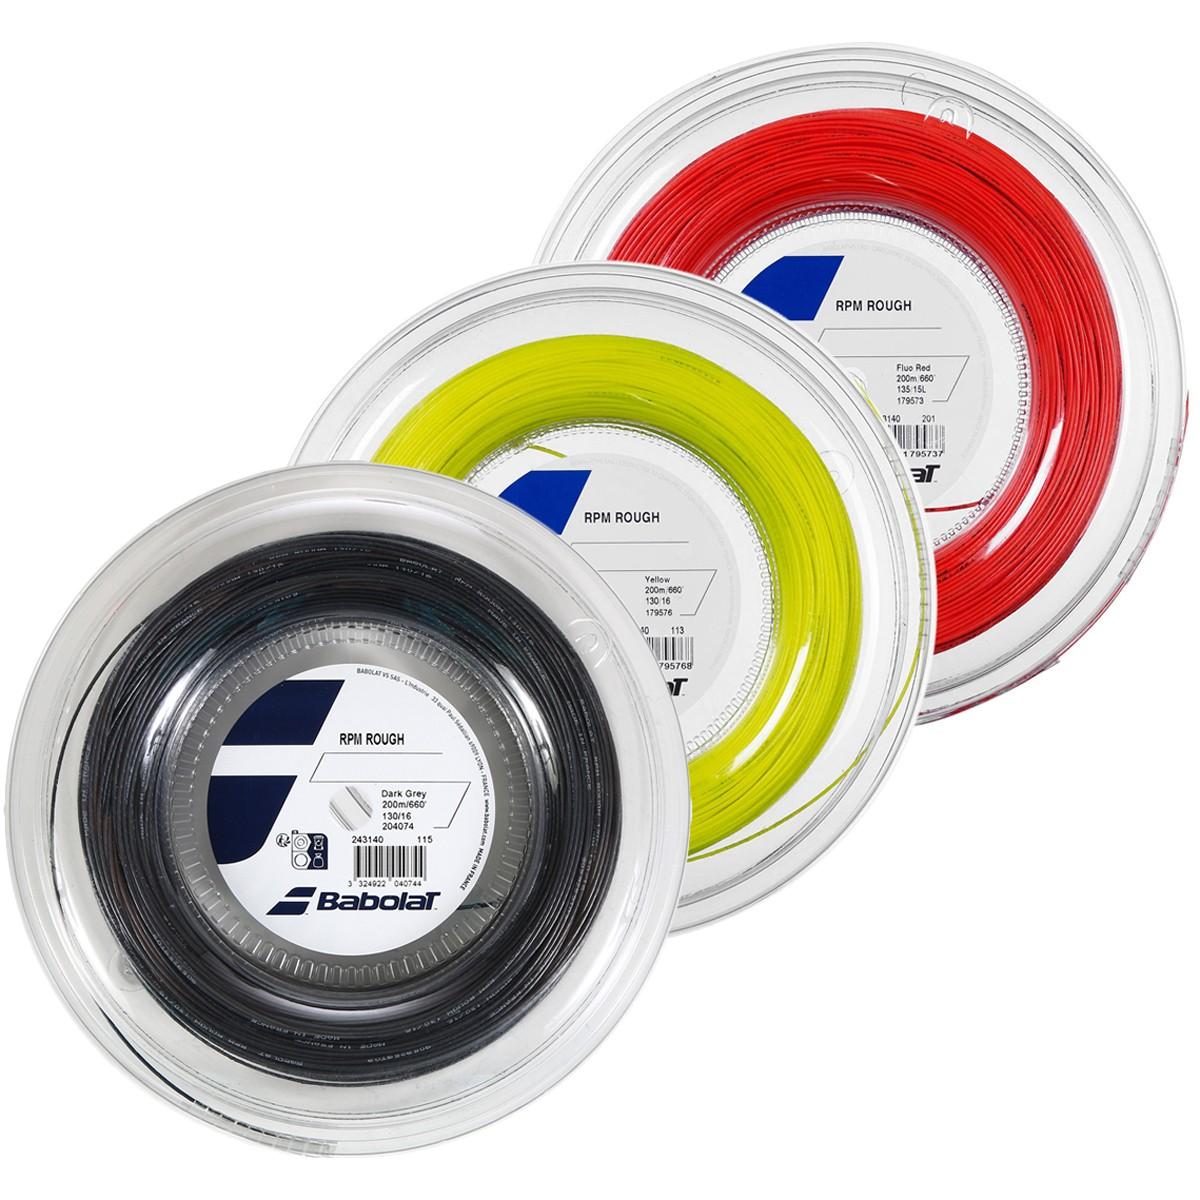 BOBINE BABOLAT RPM ROUGH (200 METRES)